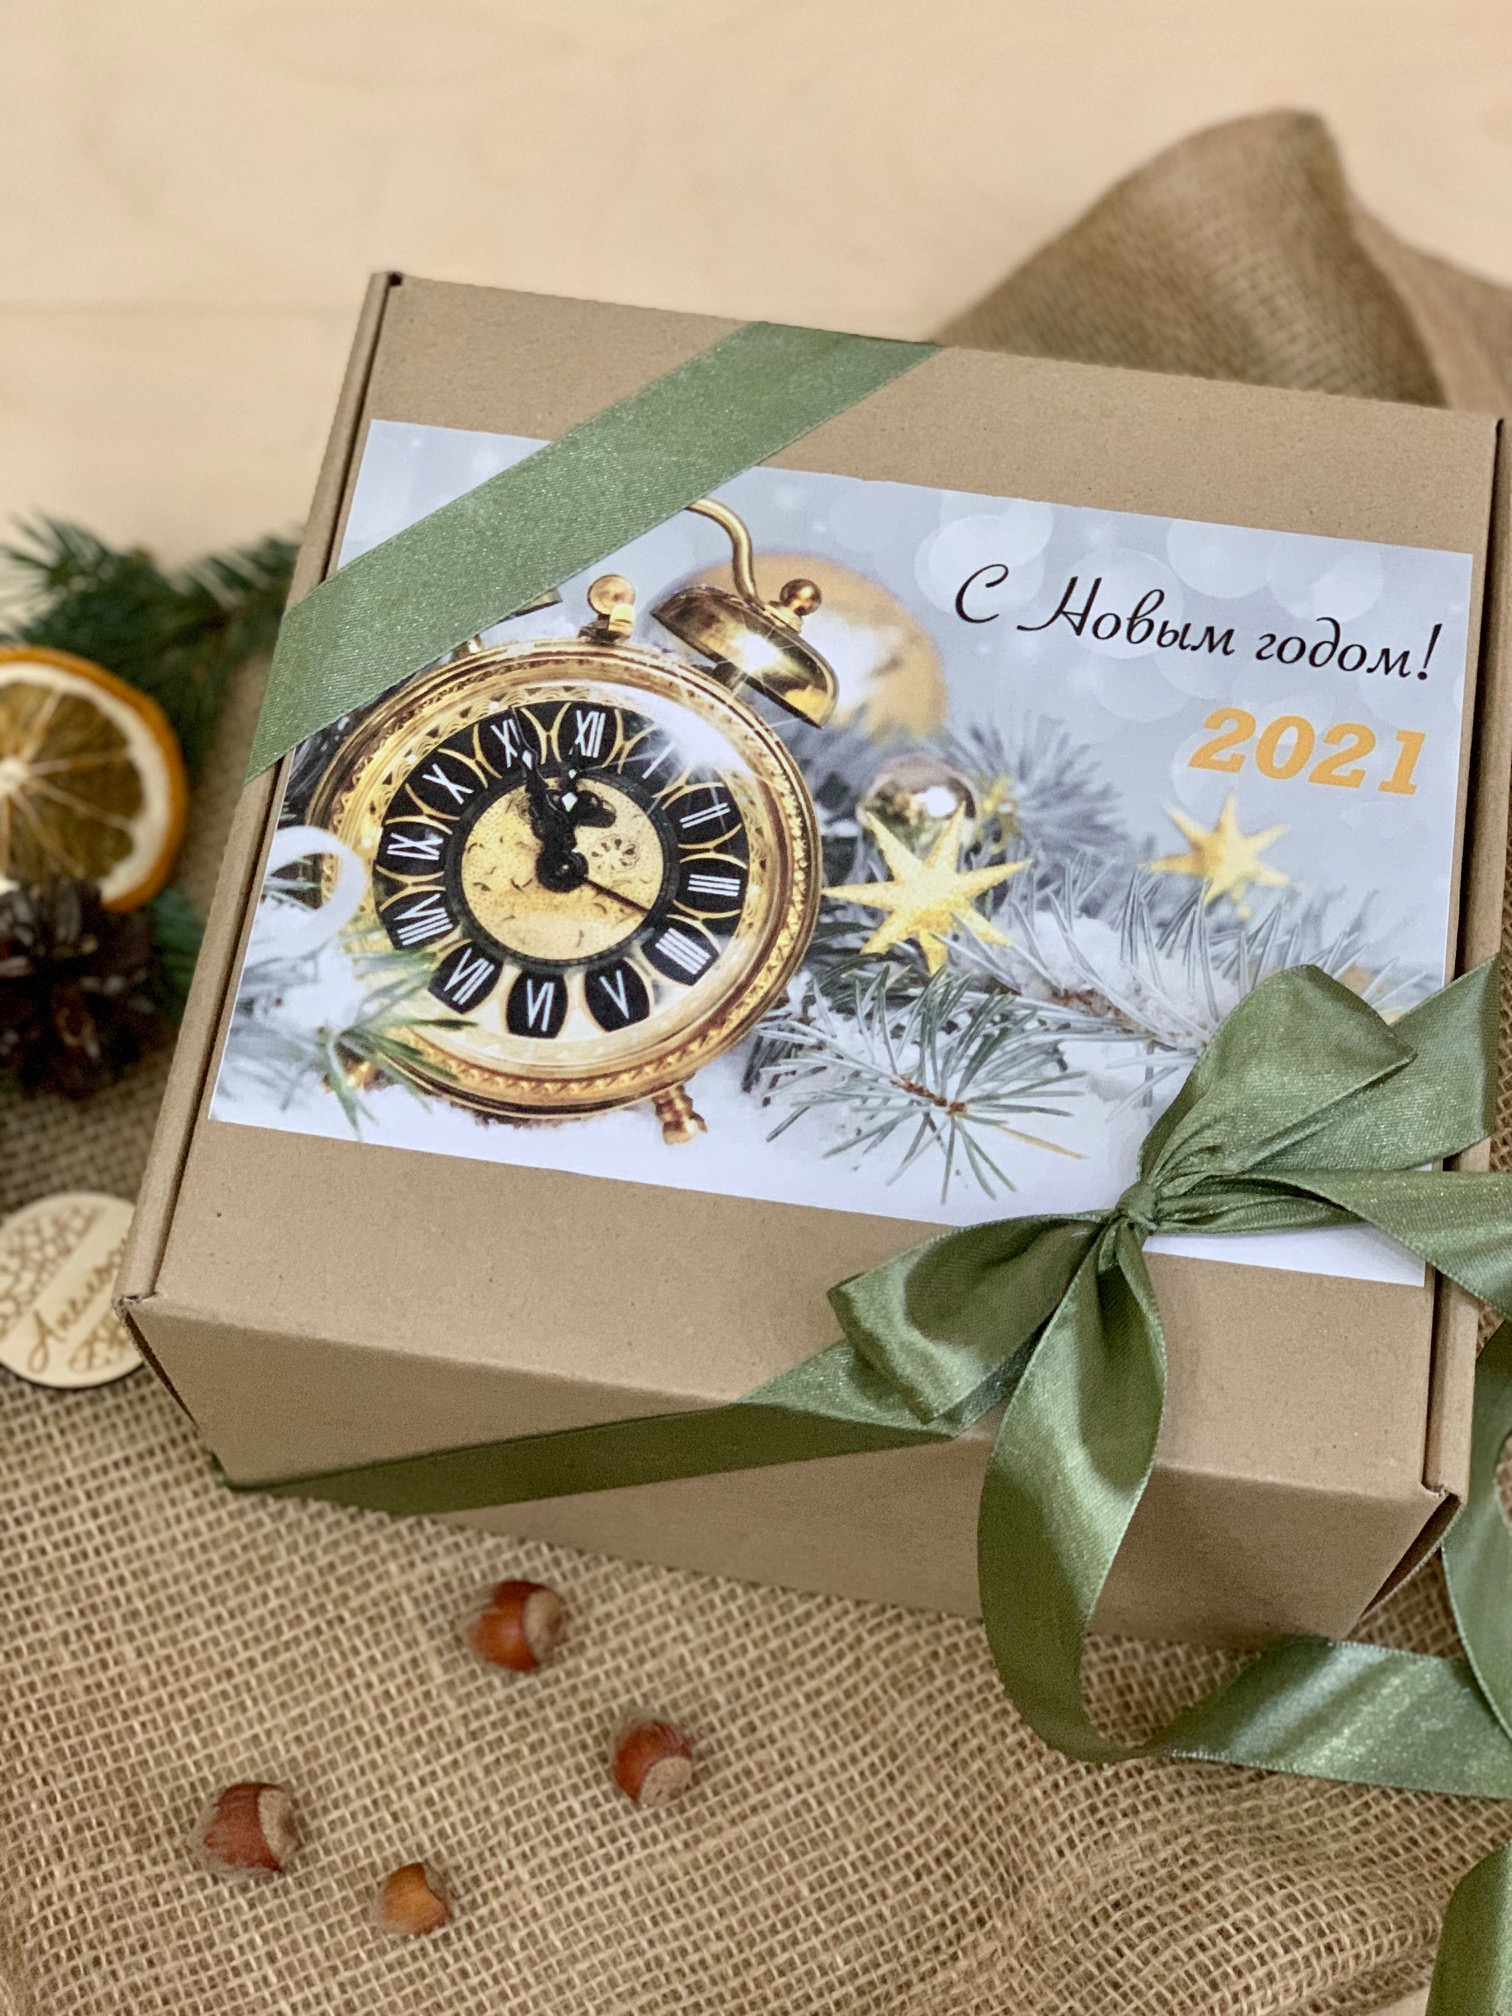 корпоративные подарки к любому празднику, новогодние подарки, новинки на сайте